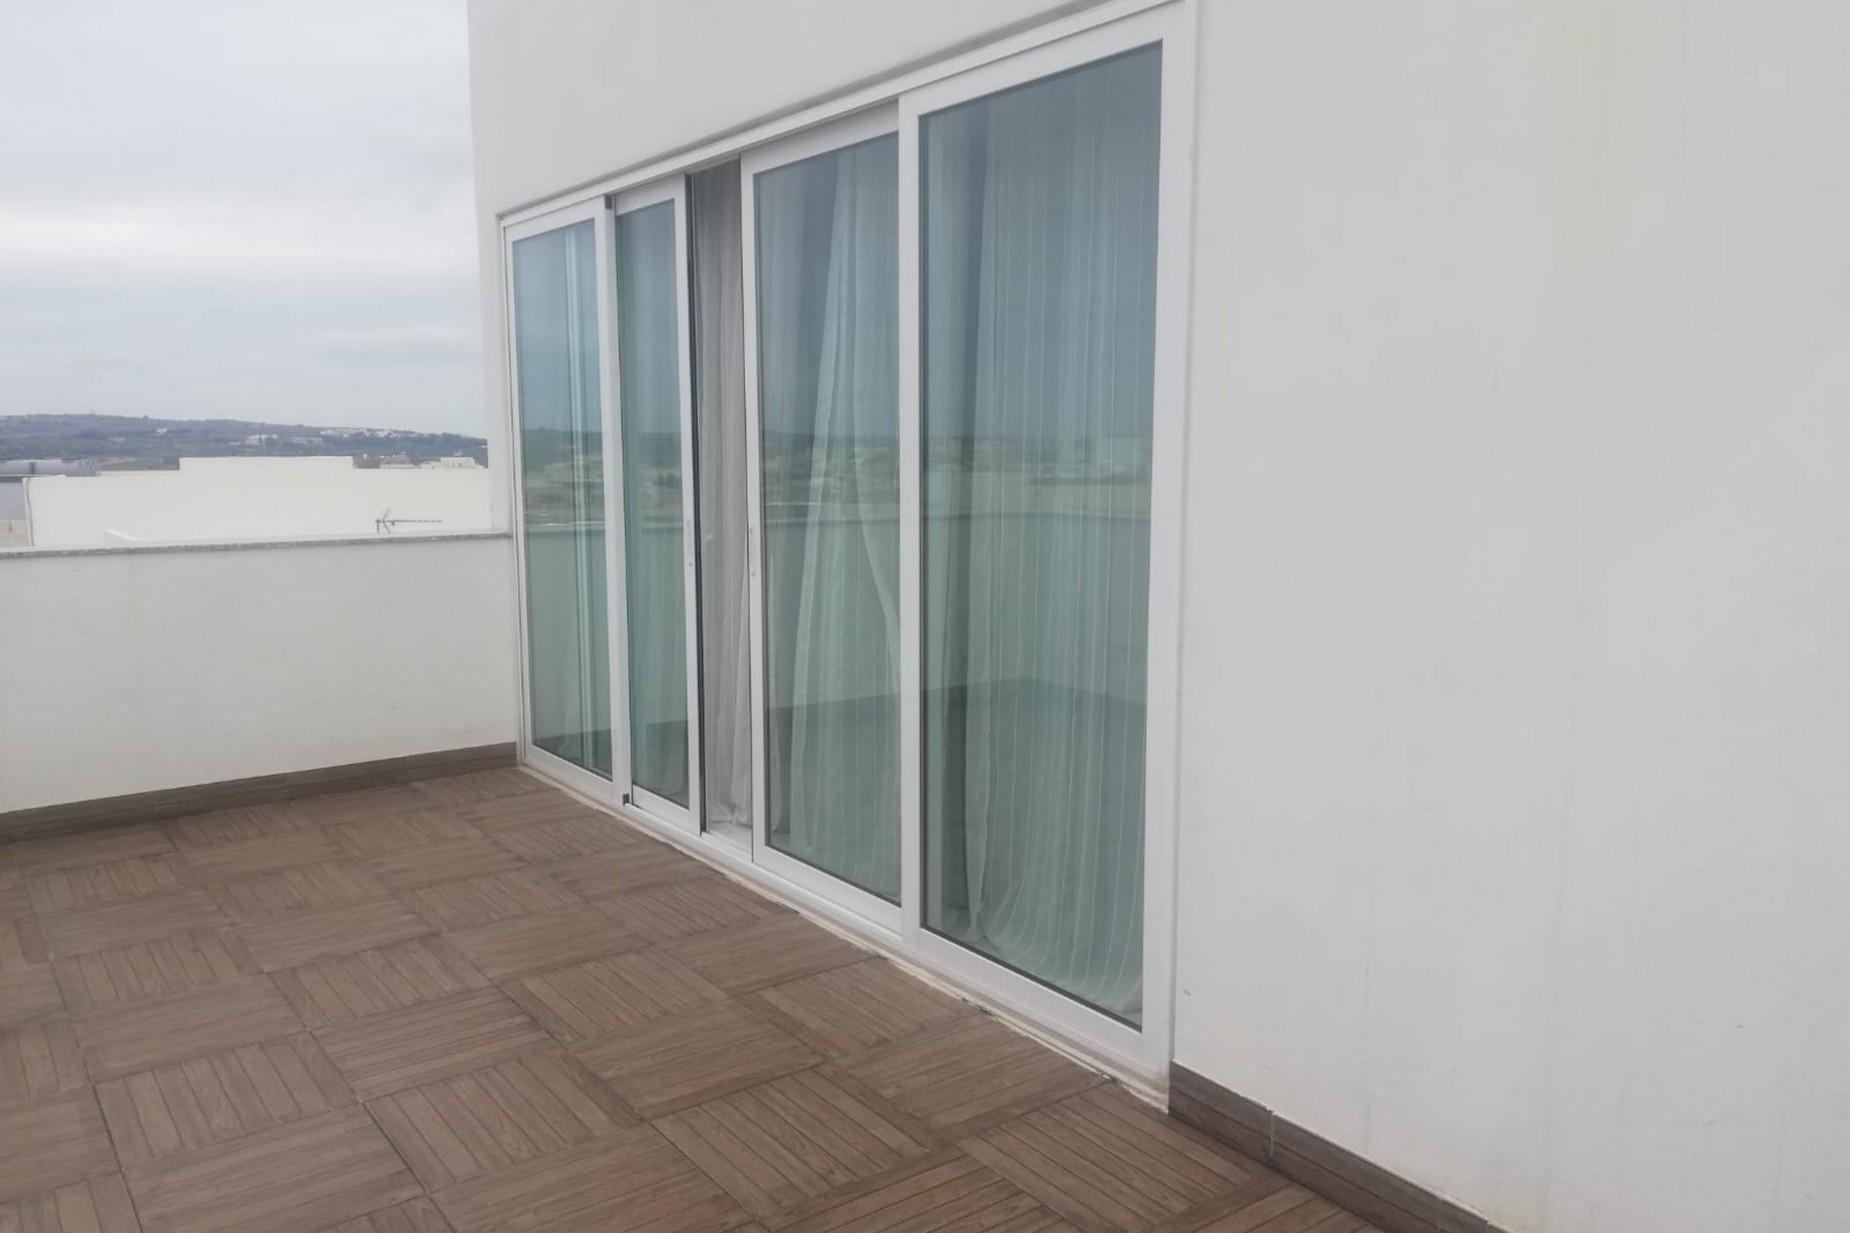 3 bed Apartment For Rent in Rabat, Rabat - thumb 8